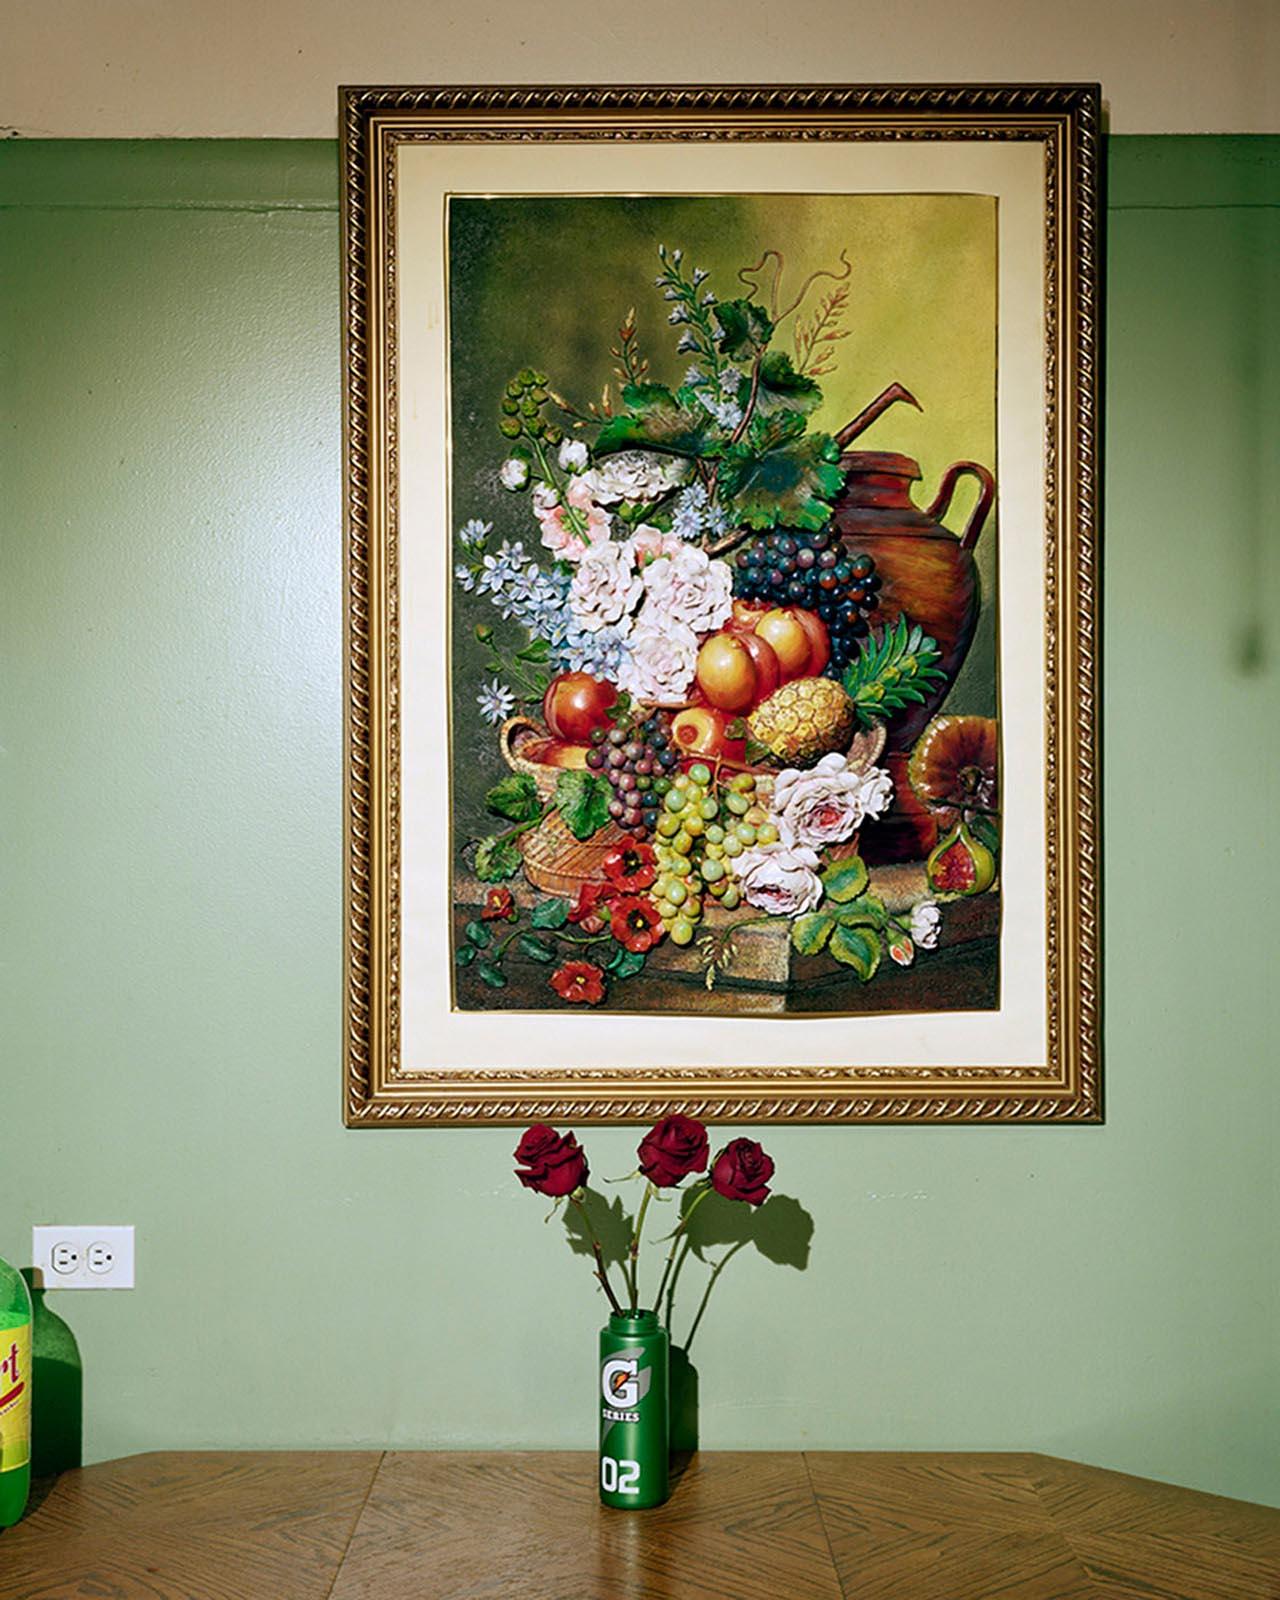 "Juan Giraldo, Roses, Chicago, IL 2013, Archival Pigment Print, 24""x 30"""